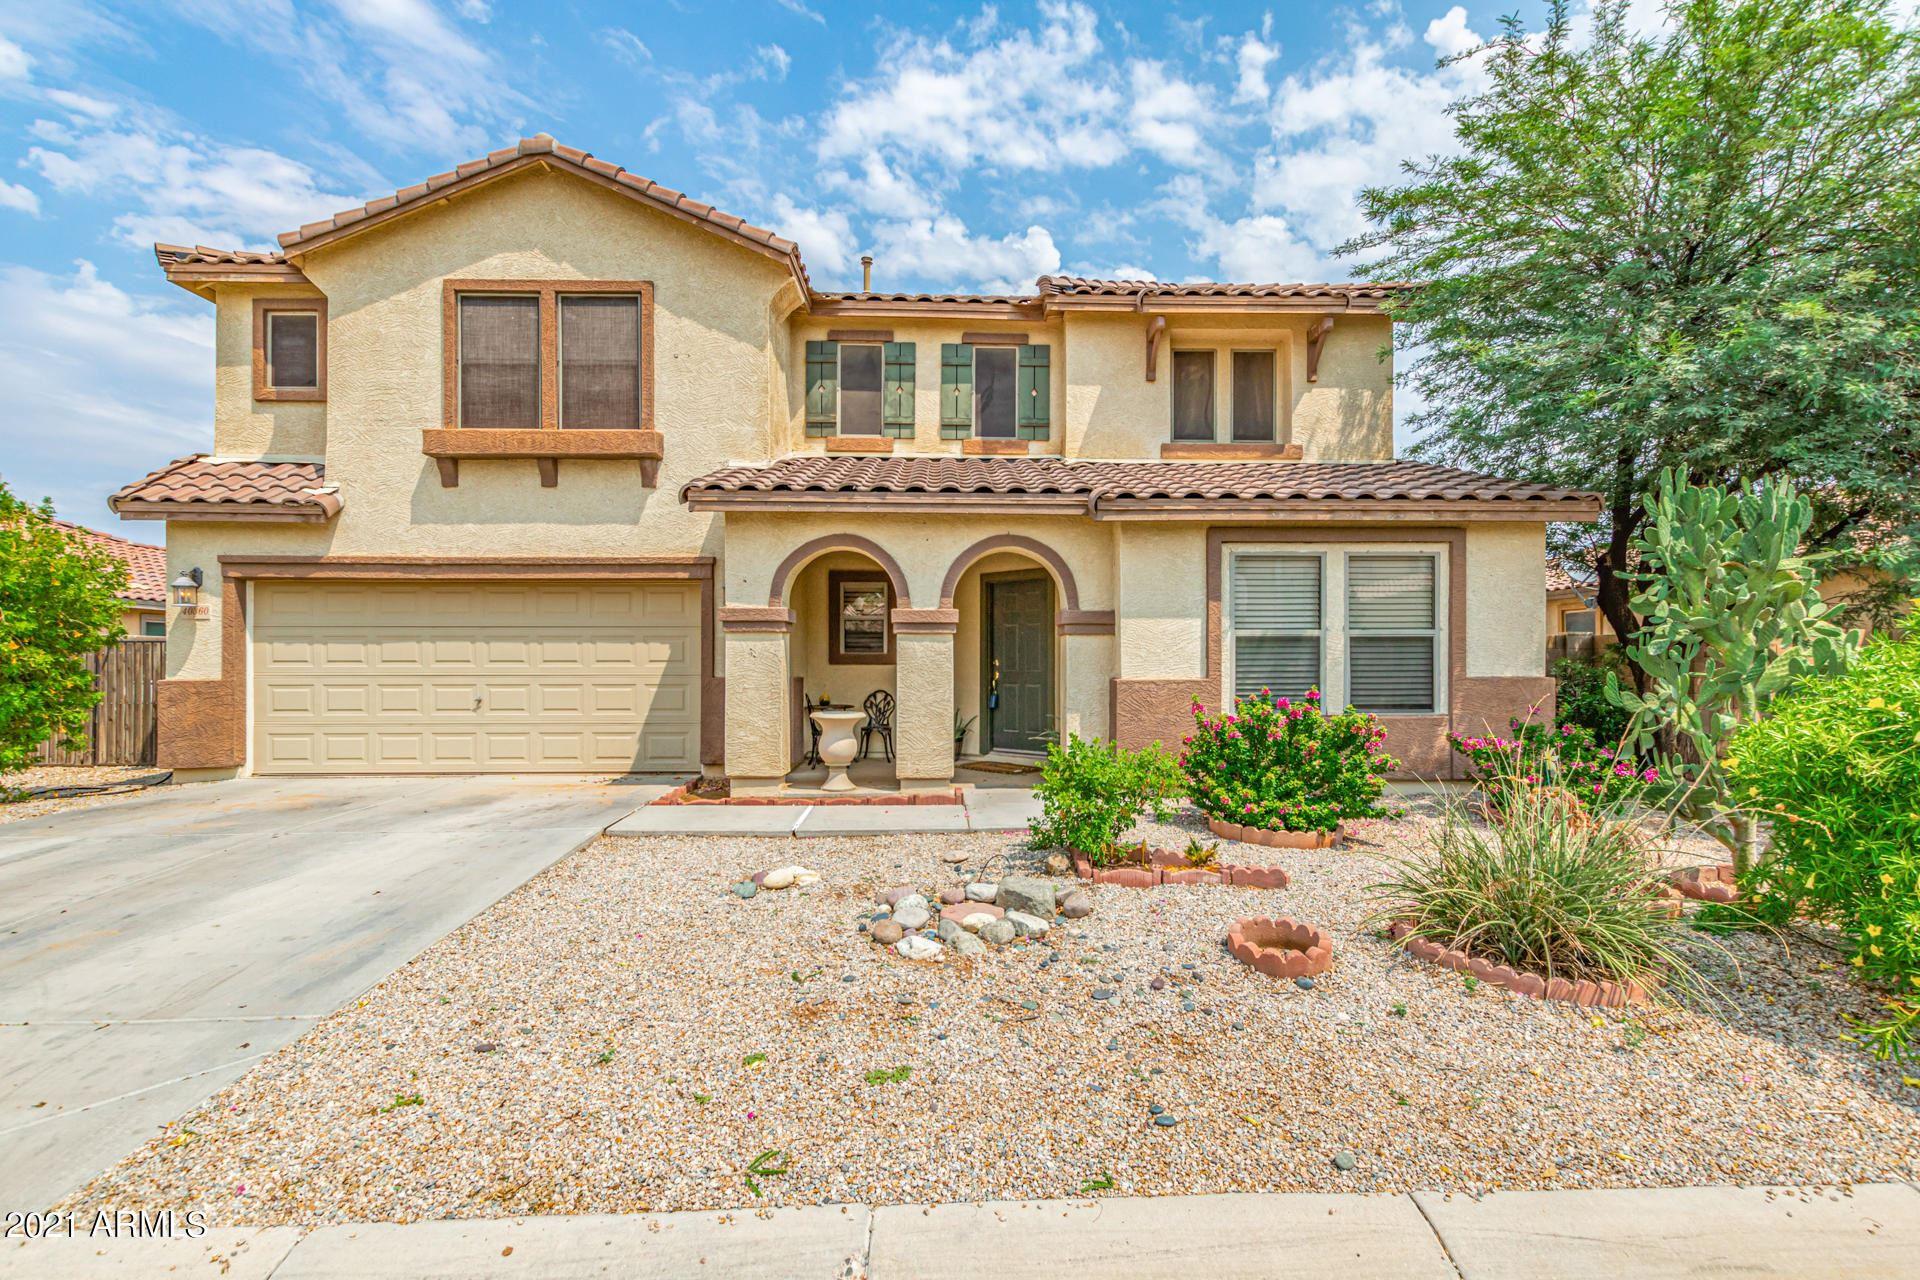 Photo for 40360 W MARION MAY Lane, Maricopa, AZ 85138 (MLS # 6281247)